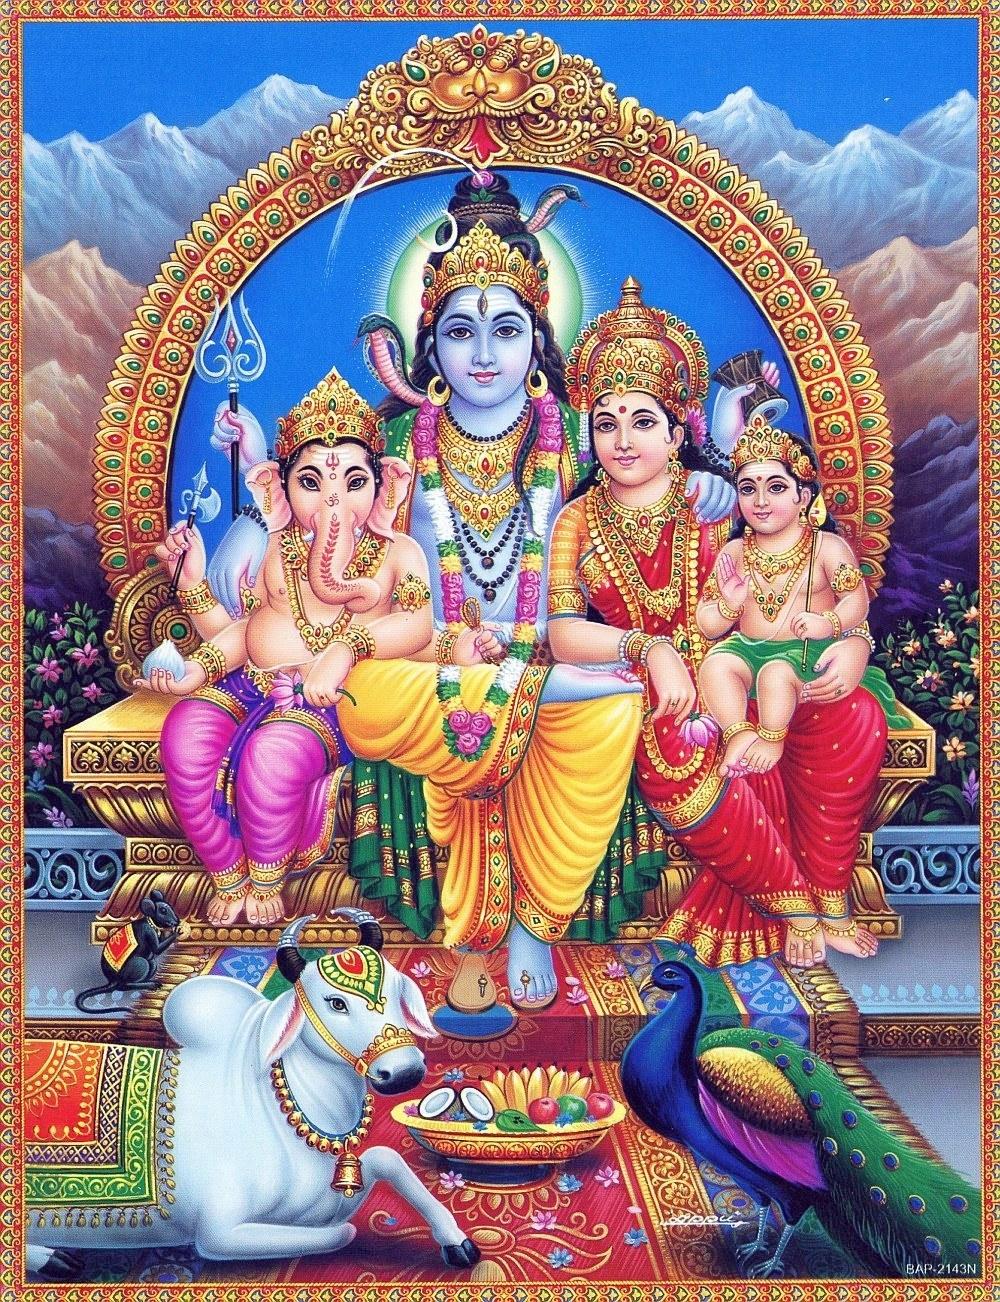 Lord Shiva with His Family Parvati, Ganesh, Murugan